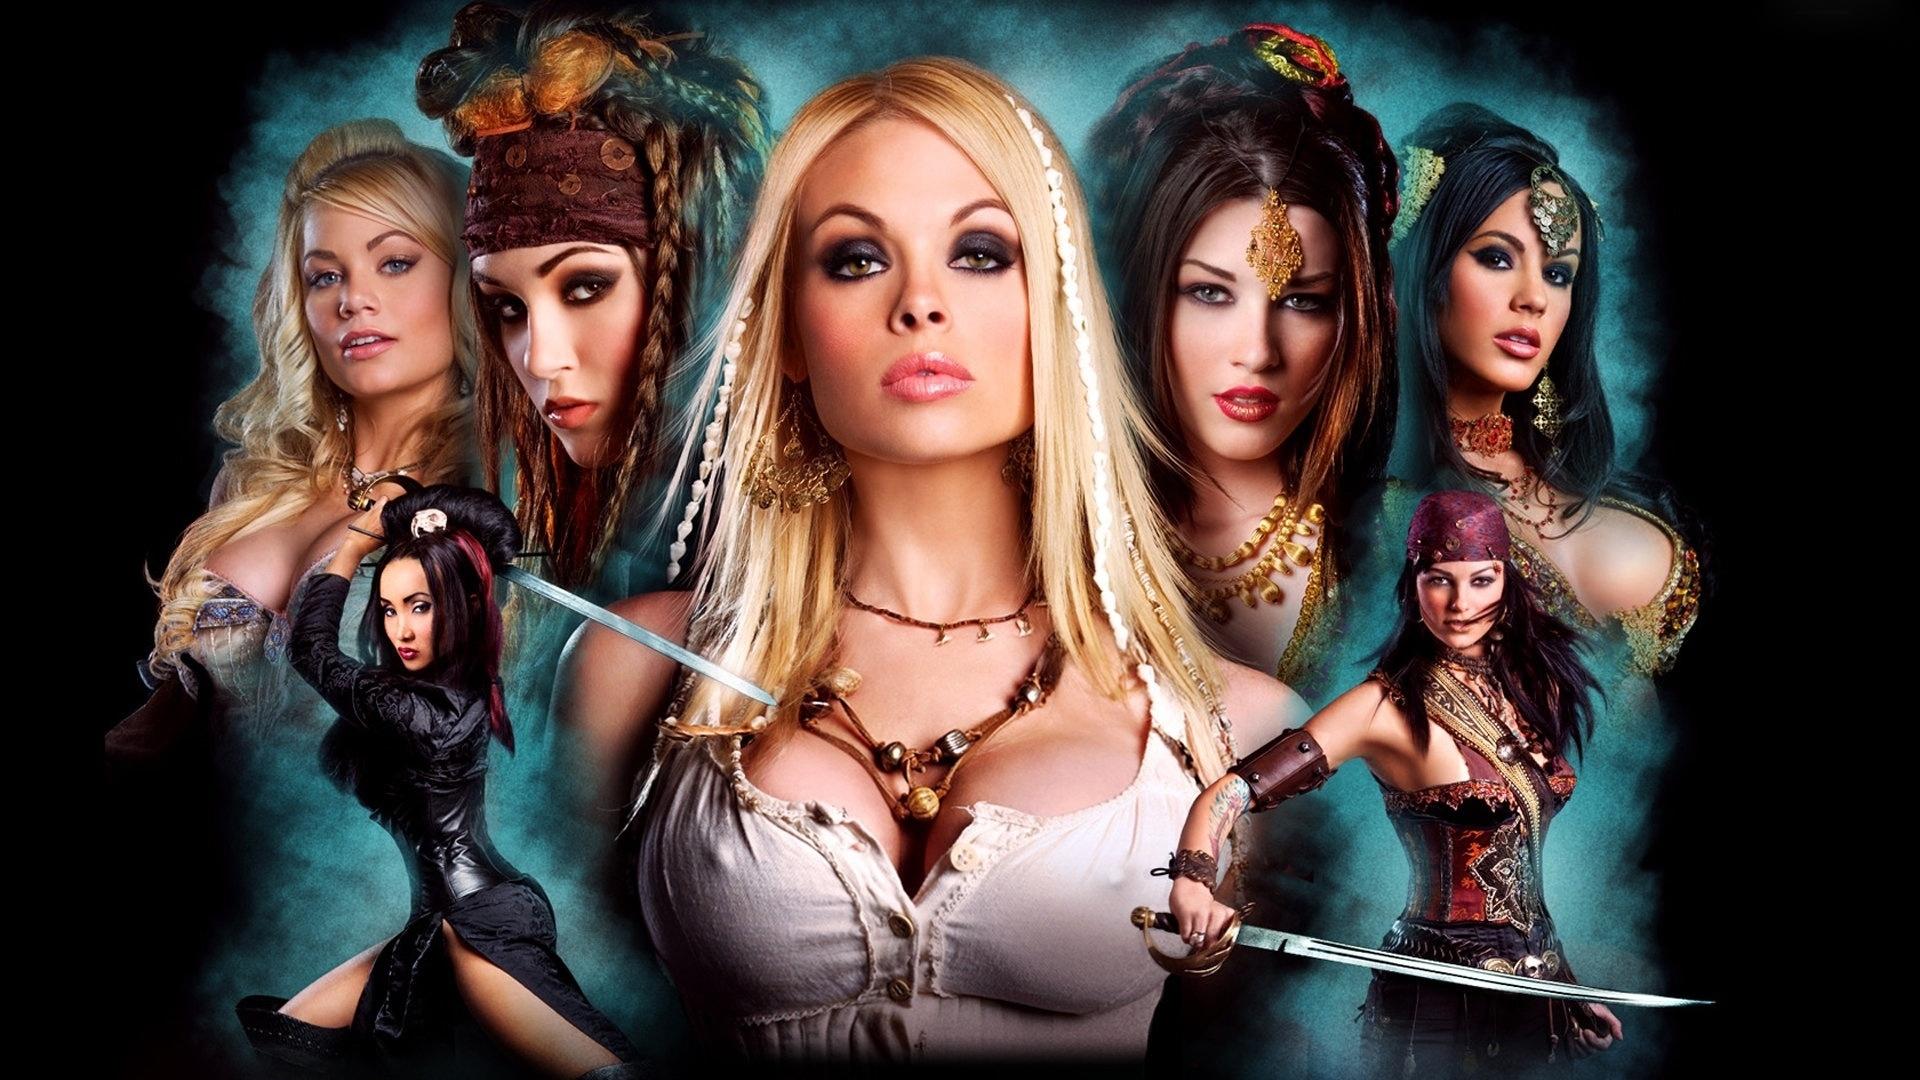 Link piratesxxx full movie 3gp download sexy scenes